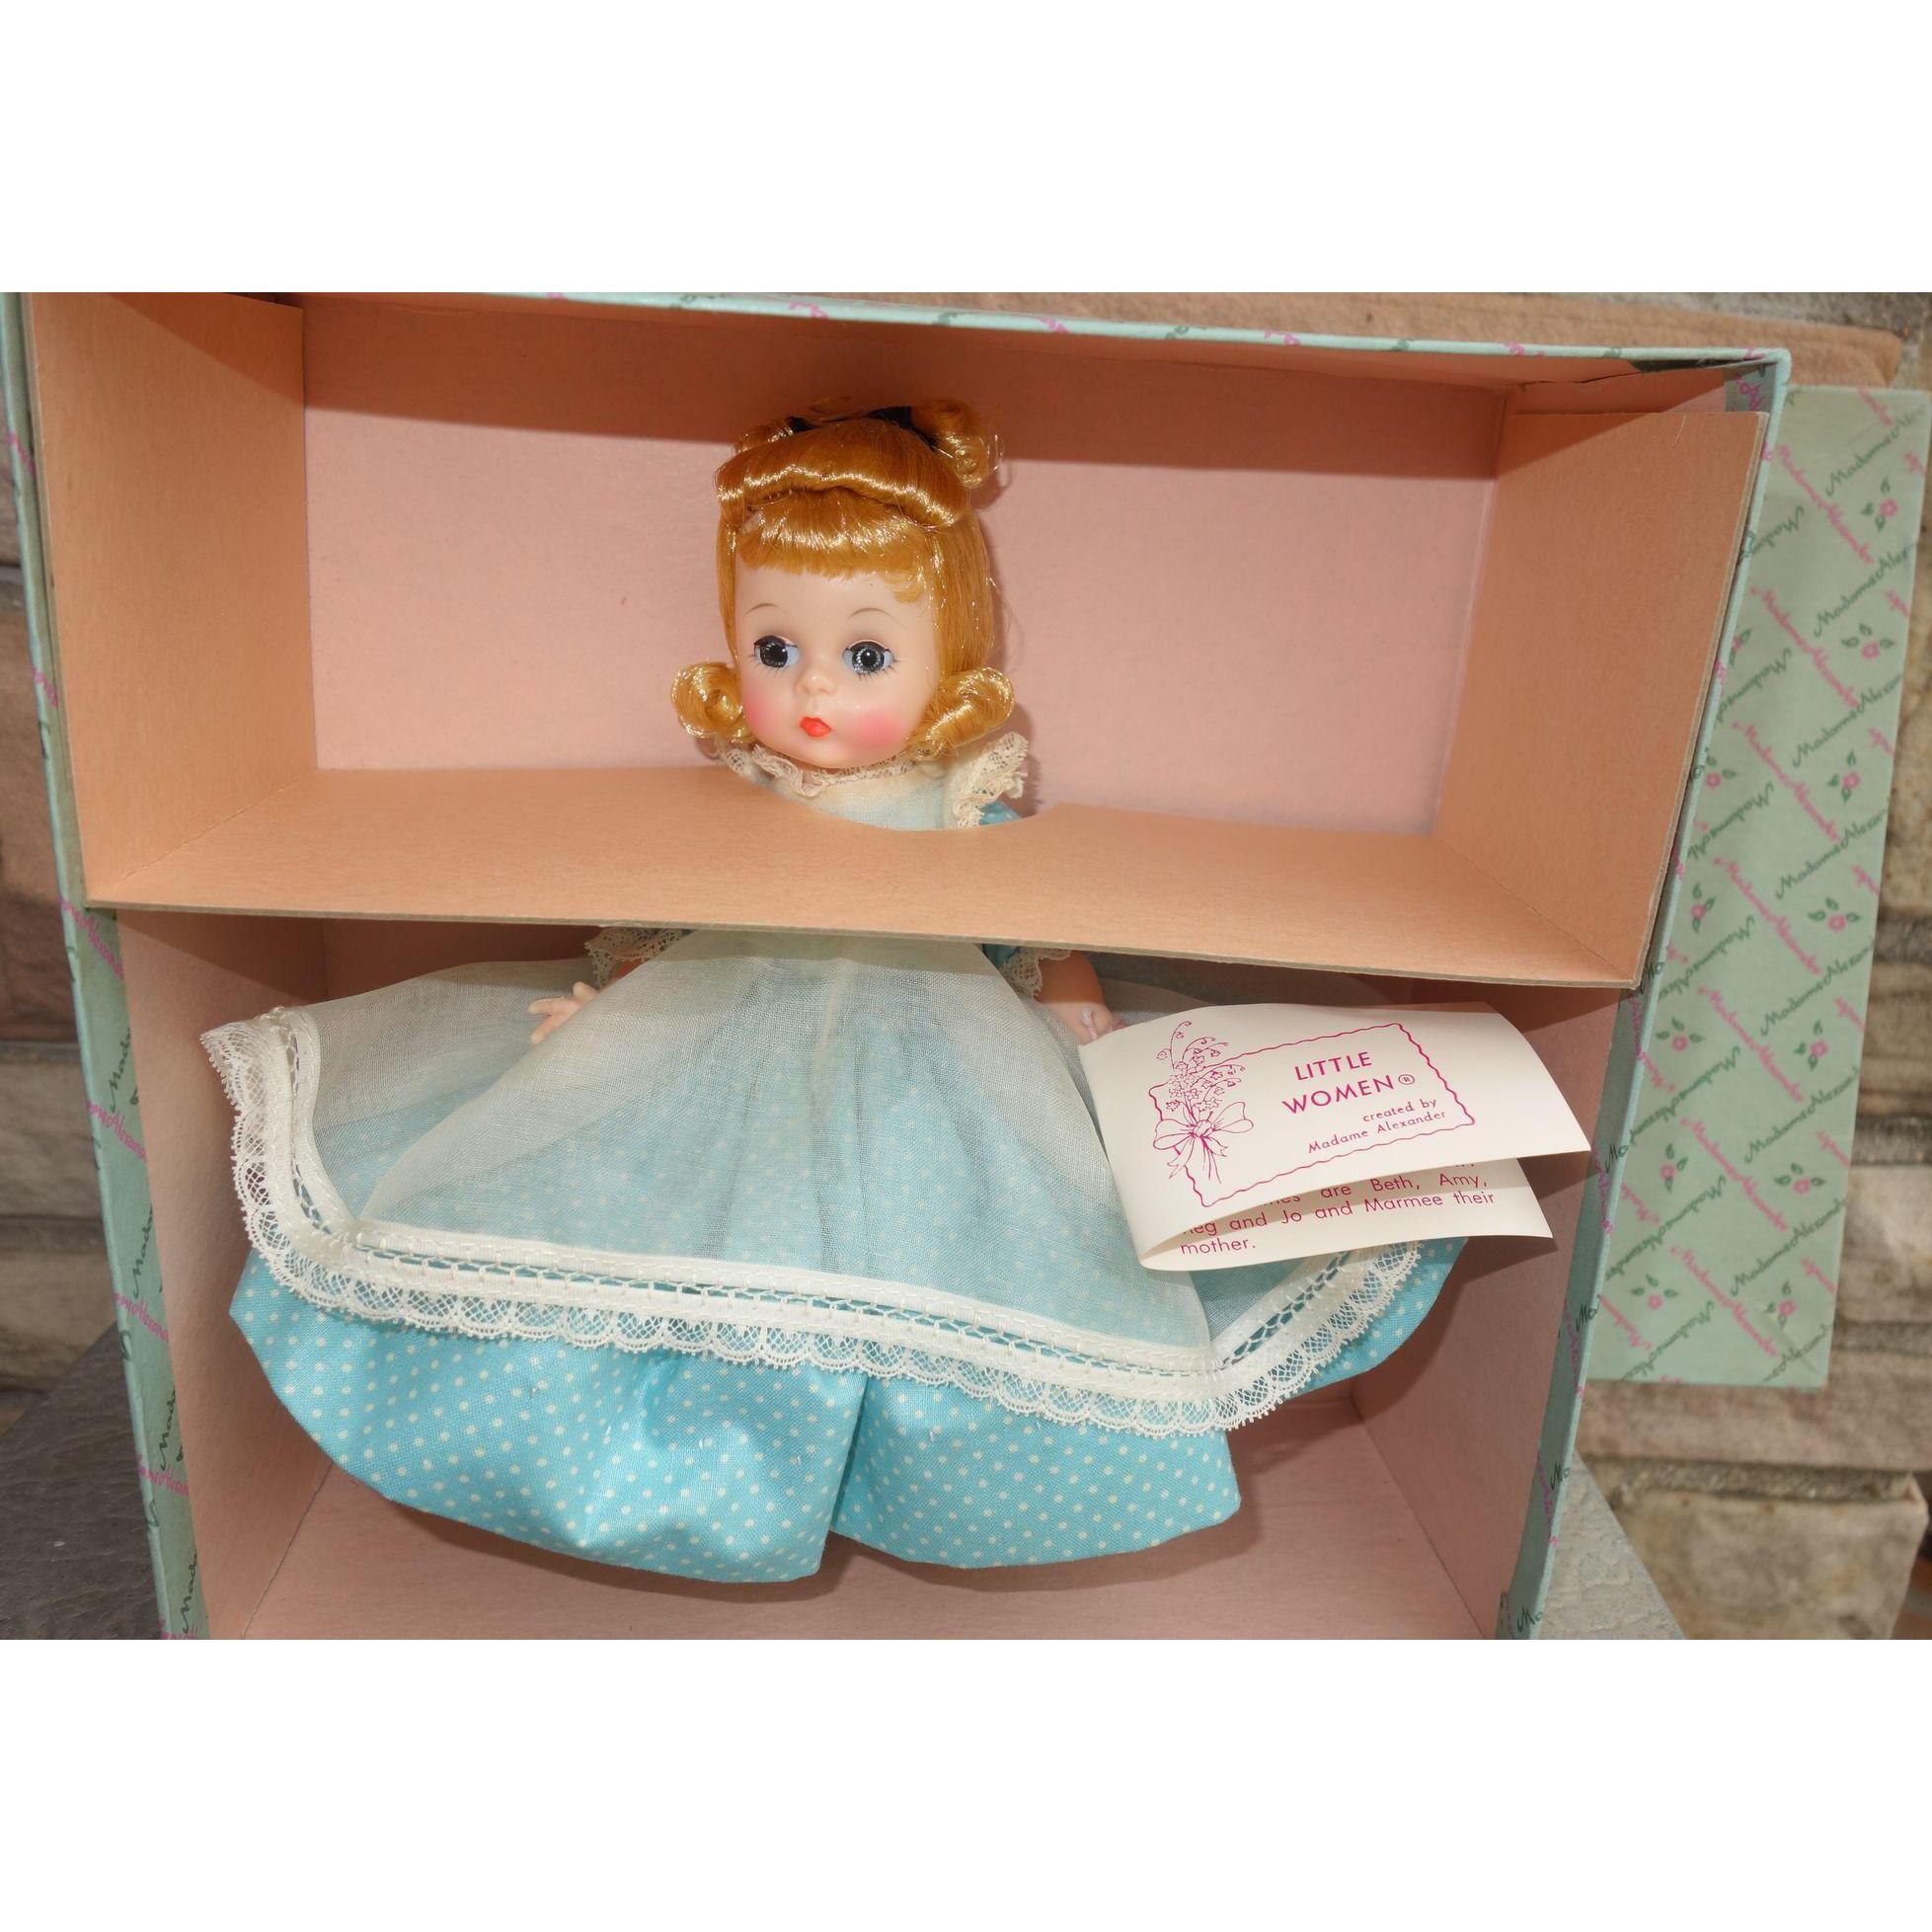 Madame Alexander Amy Bent Knee Walker Doll LIttle Women MINT IN BOX 1960's